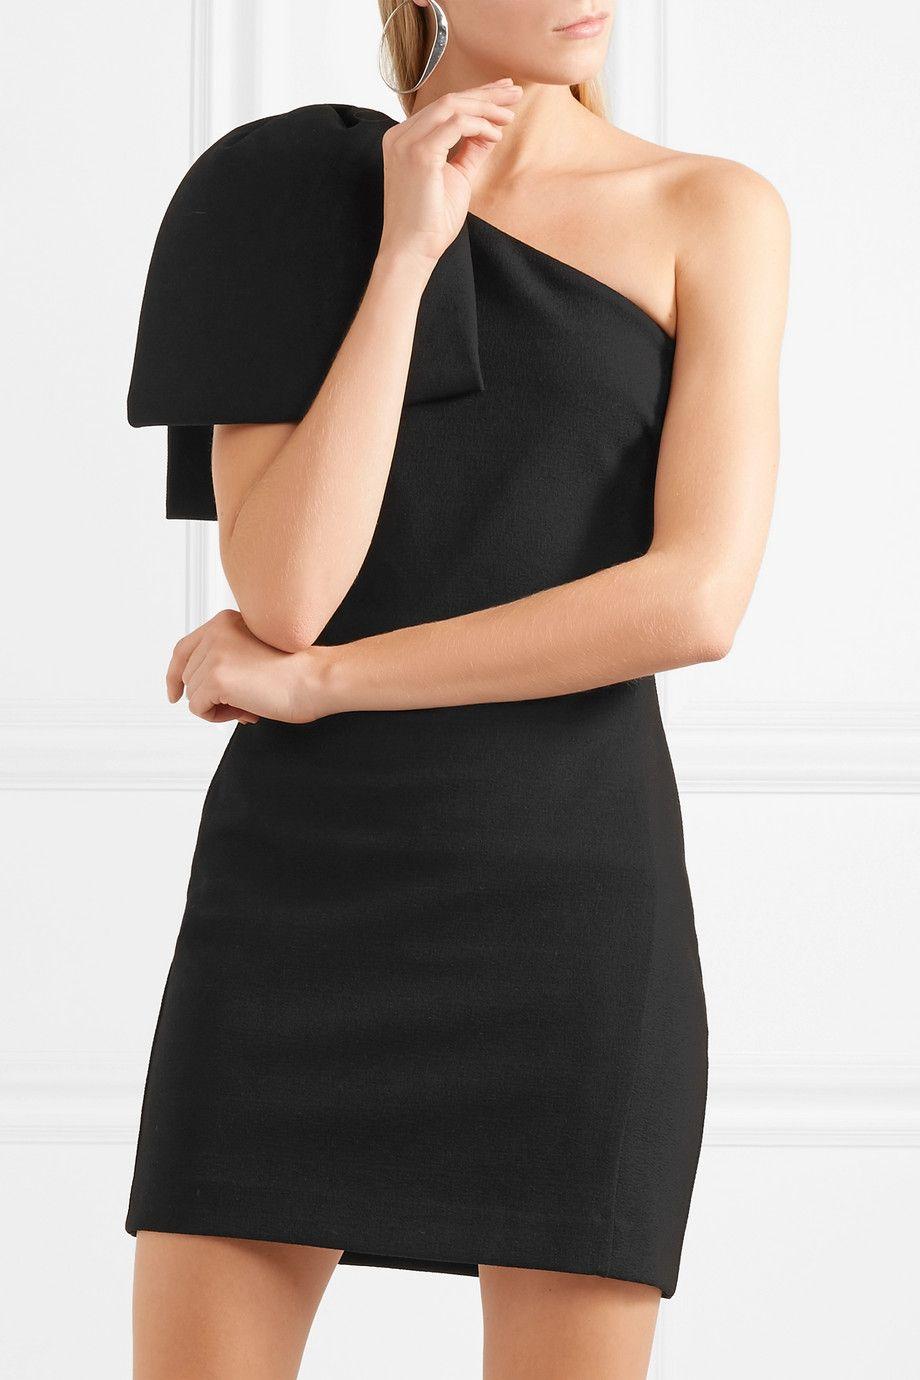 1caf977f3936 Rebecca Vallance Hamptons Bow Mini Dress - Get Dressed Hire